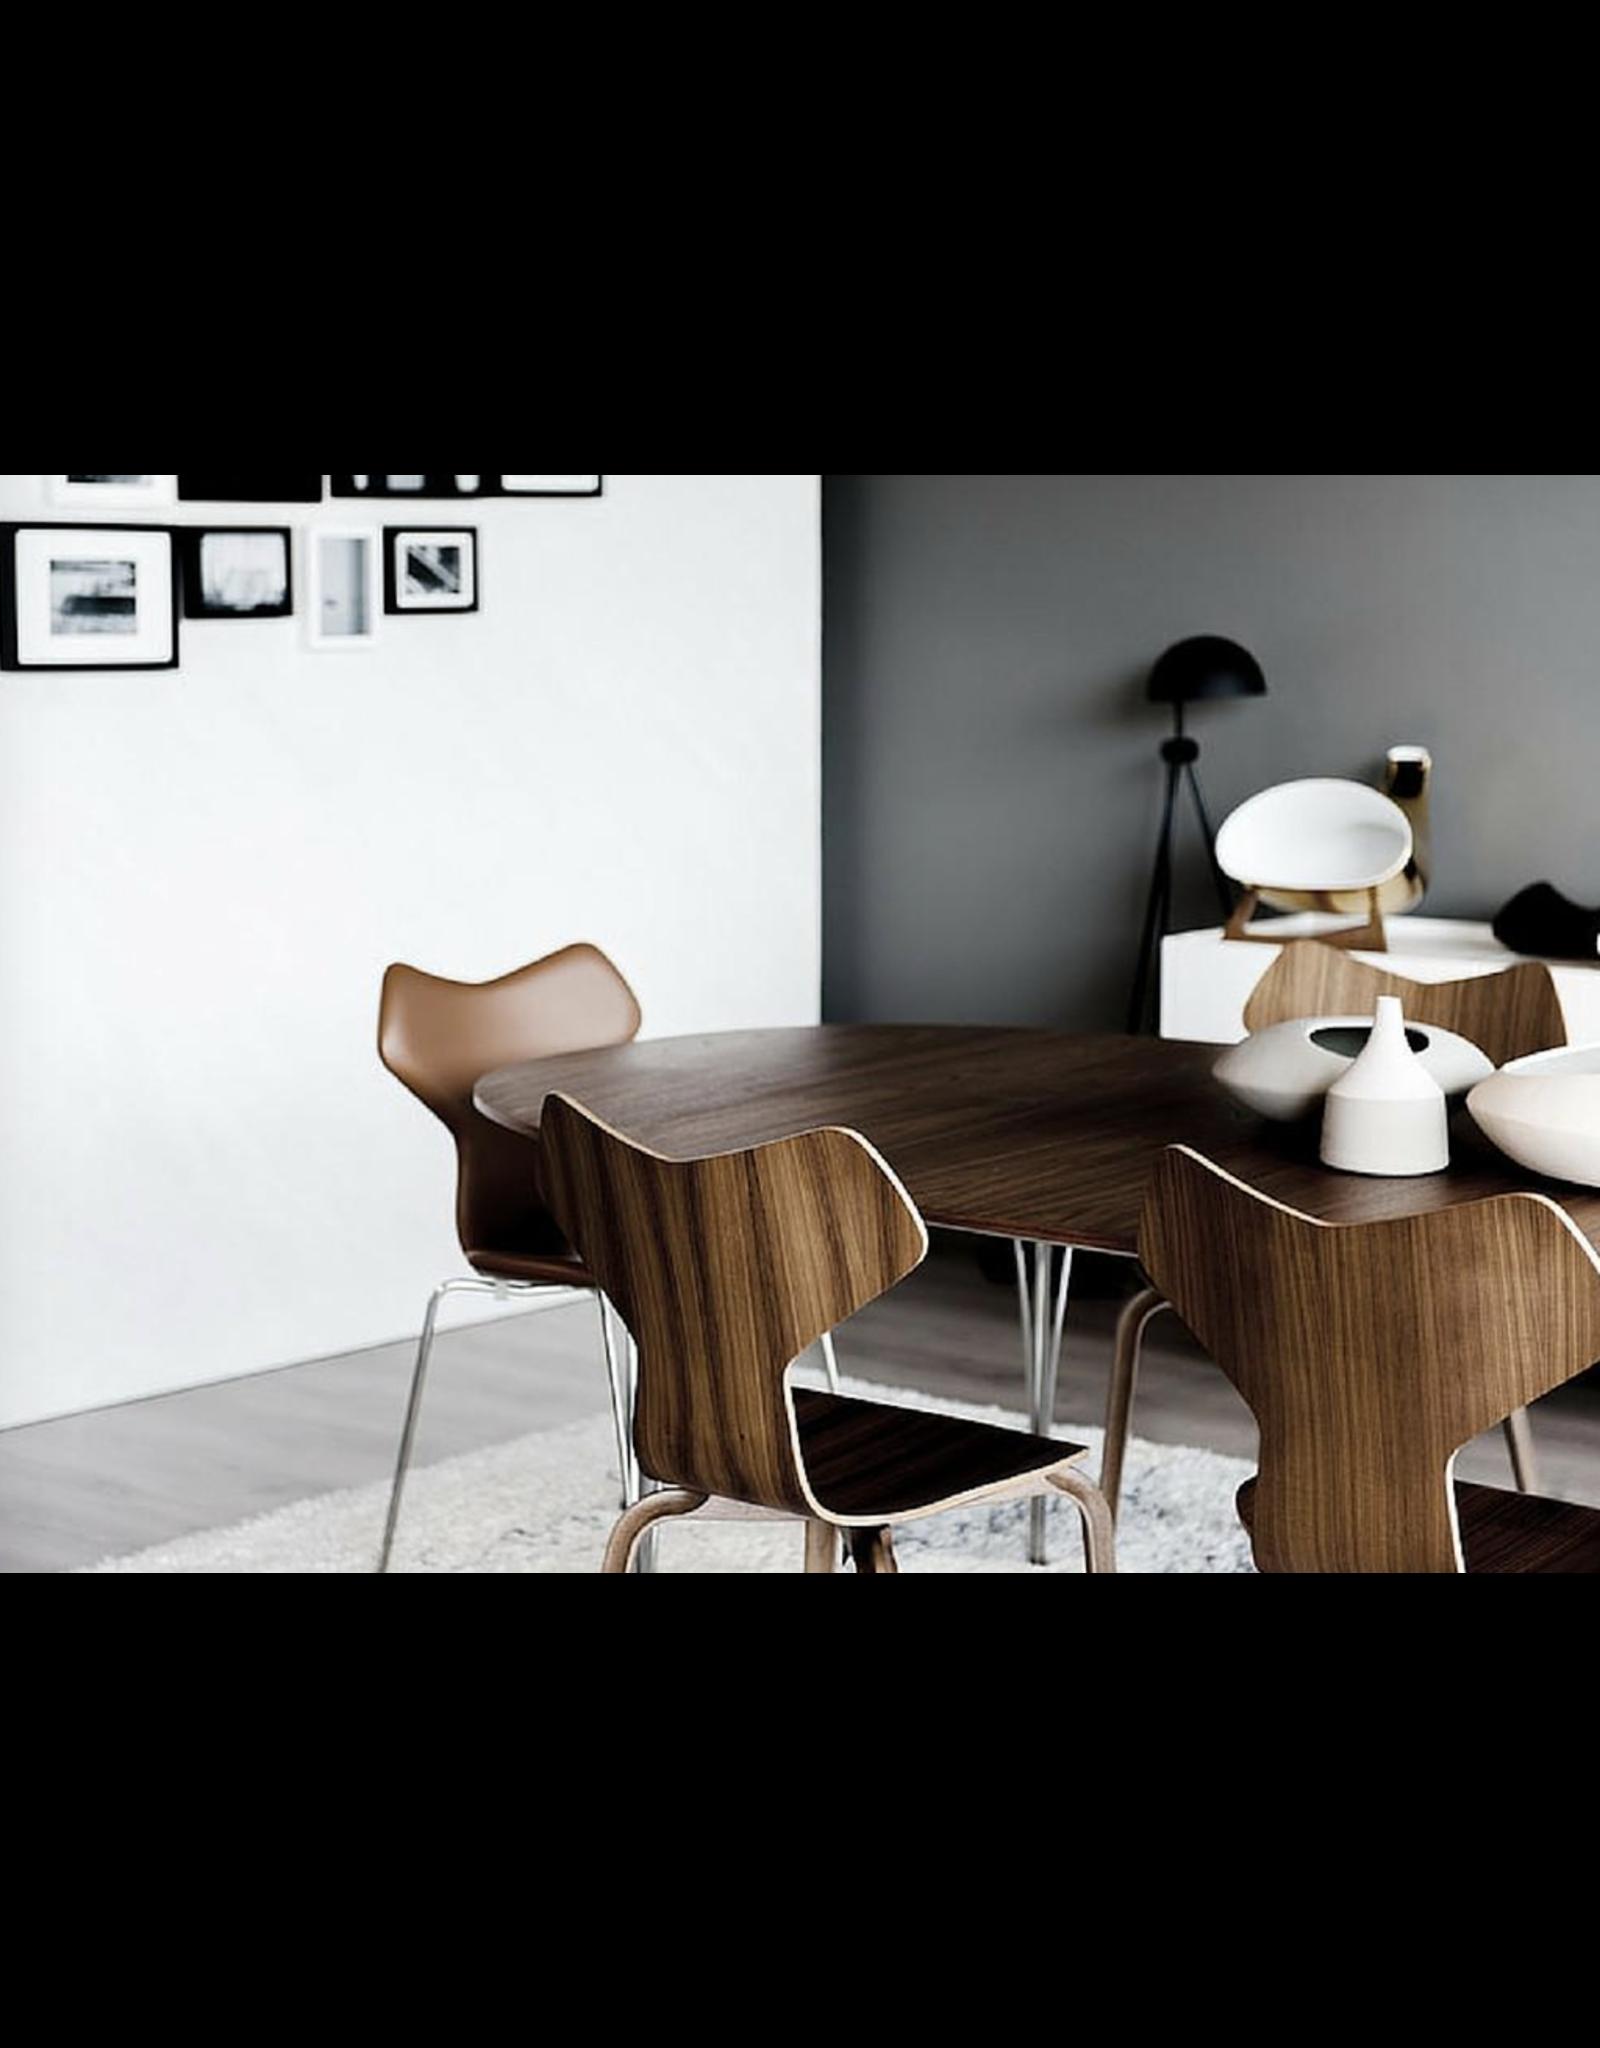 B614 SUPER-ELLIPTICAL 胡桃木桌子